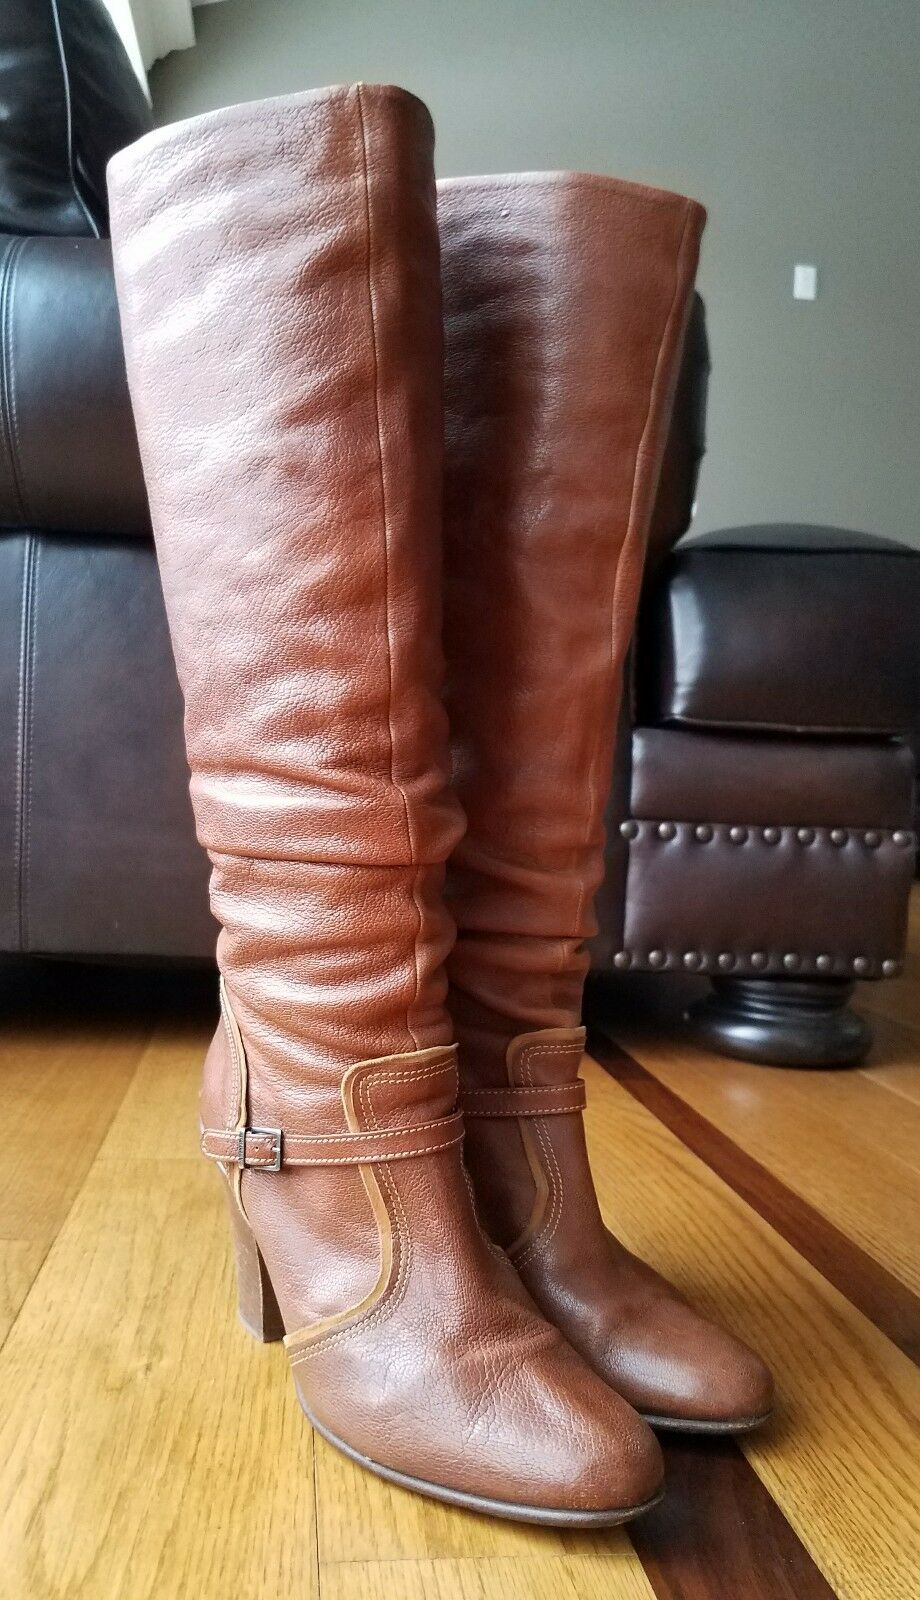 FURLA Woman's Stiefel Cognac braun Leather Leather Leather Slouchy Tall Block Heel Sz 40 9.5  5158d0